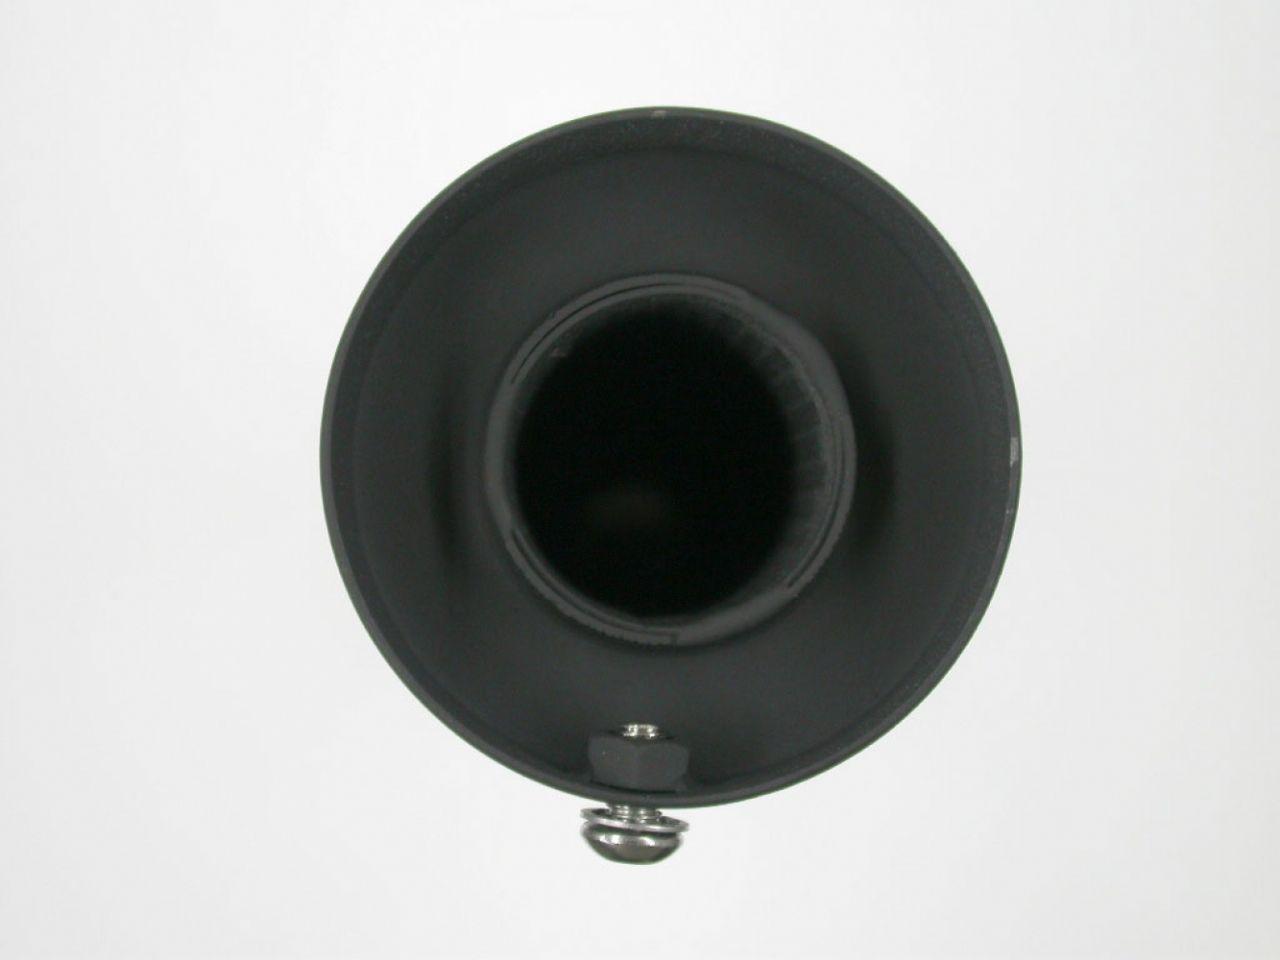 【K-FACTORY】CLR 排氣管用 內消音器 Φ35 - 「Webike-摩托百貨」